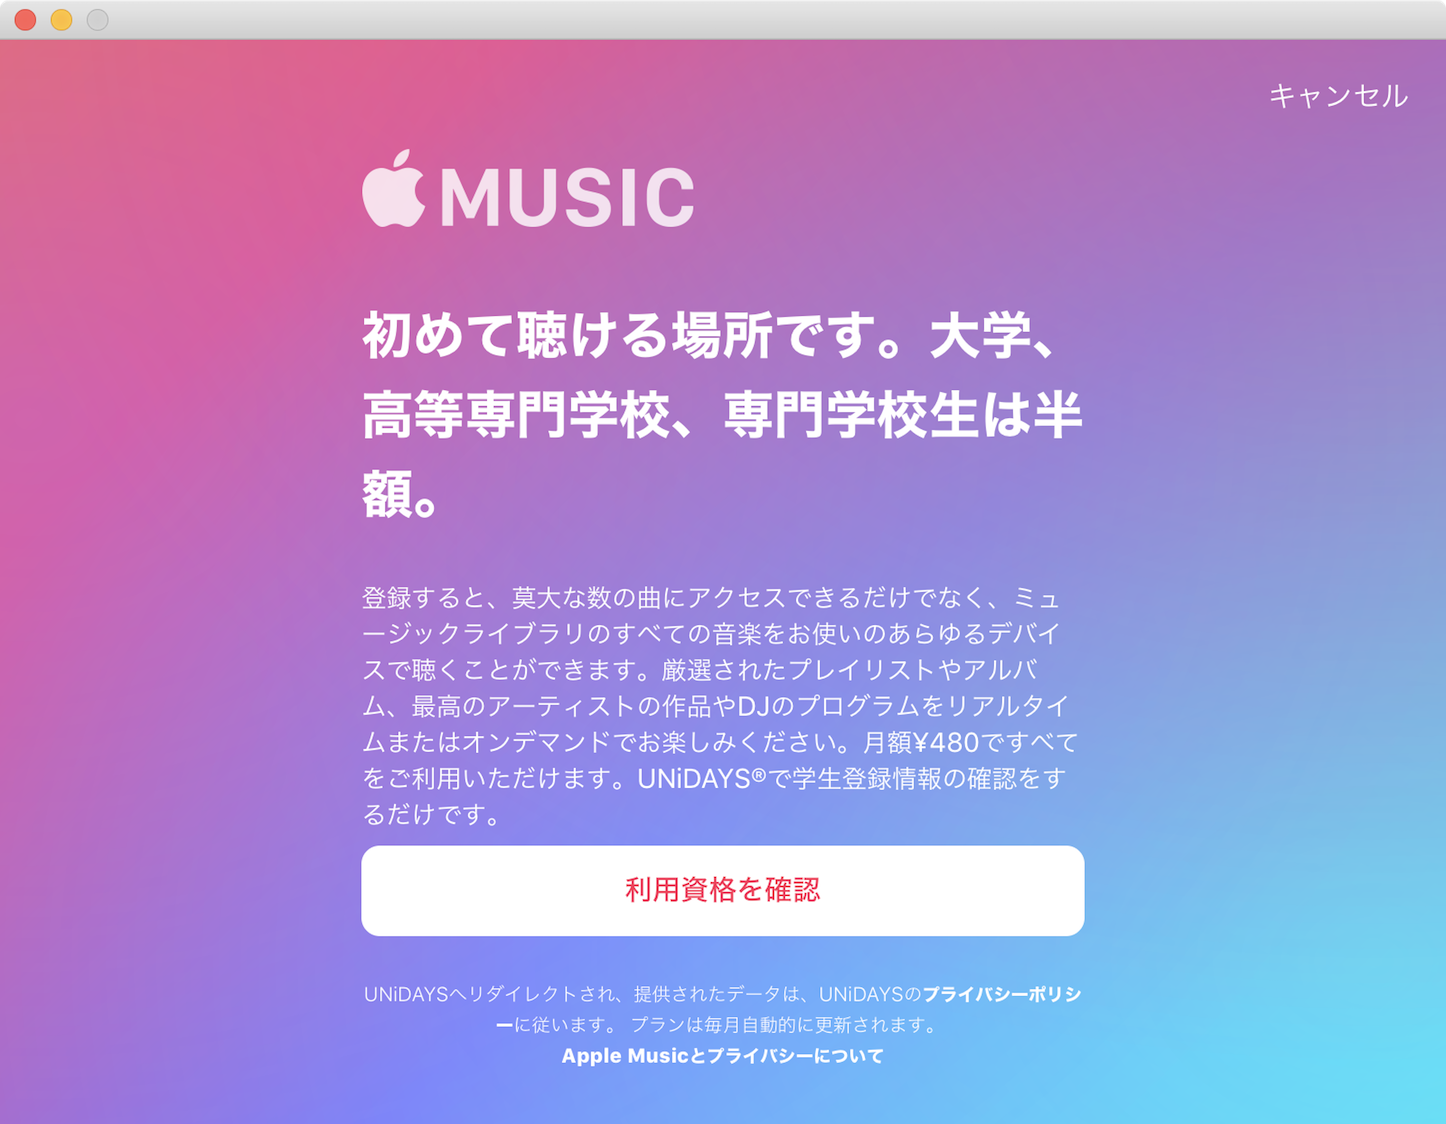 Apple Music New Users